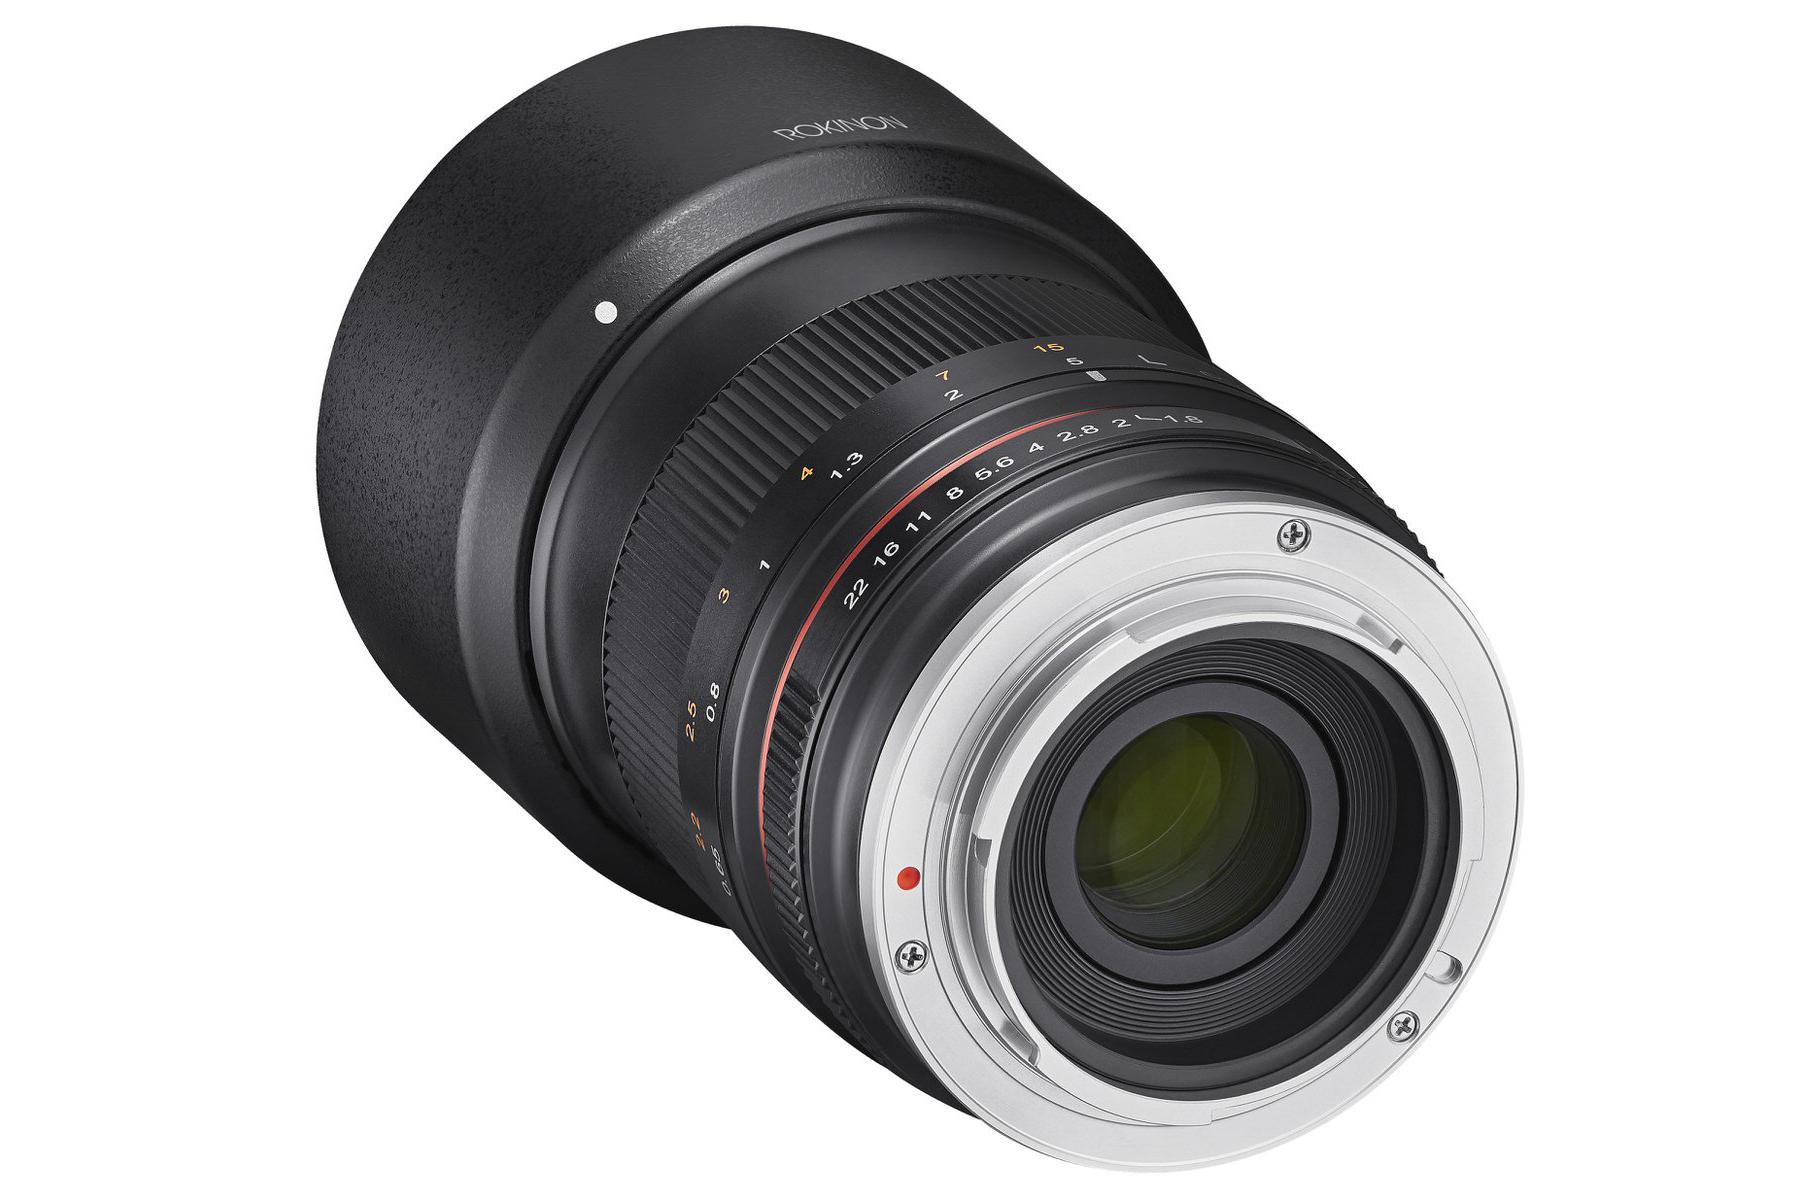 Samyang announces 85mm F1 8 lens for APS-C mirrorless cameras